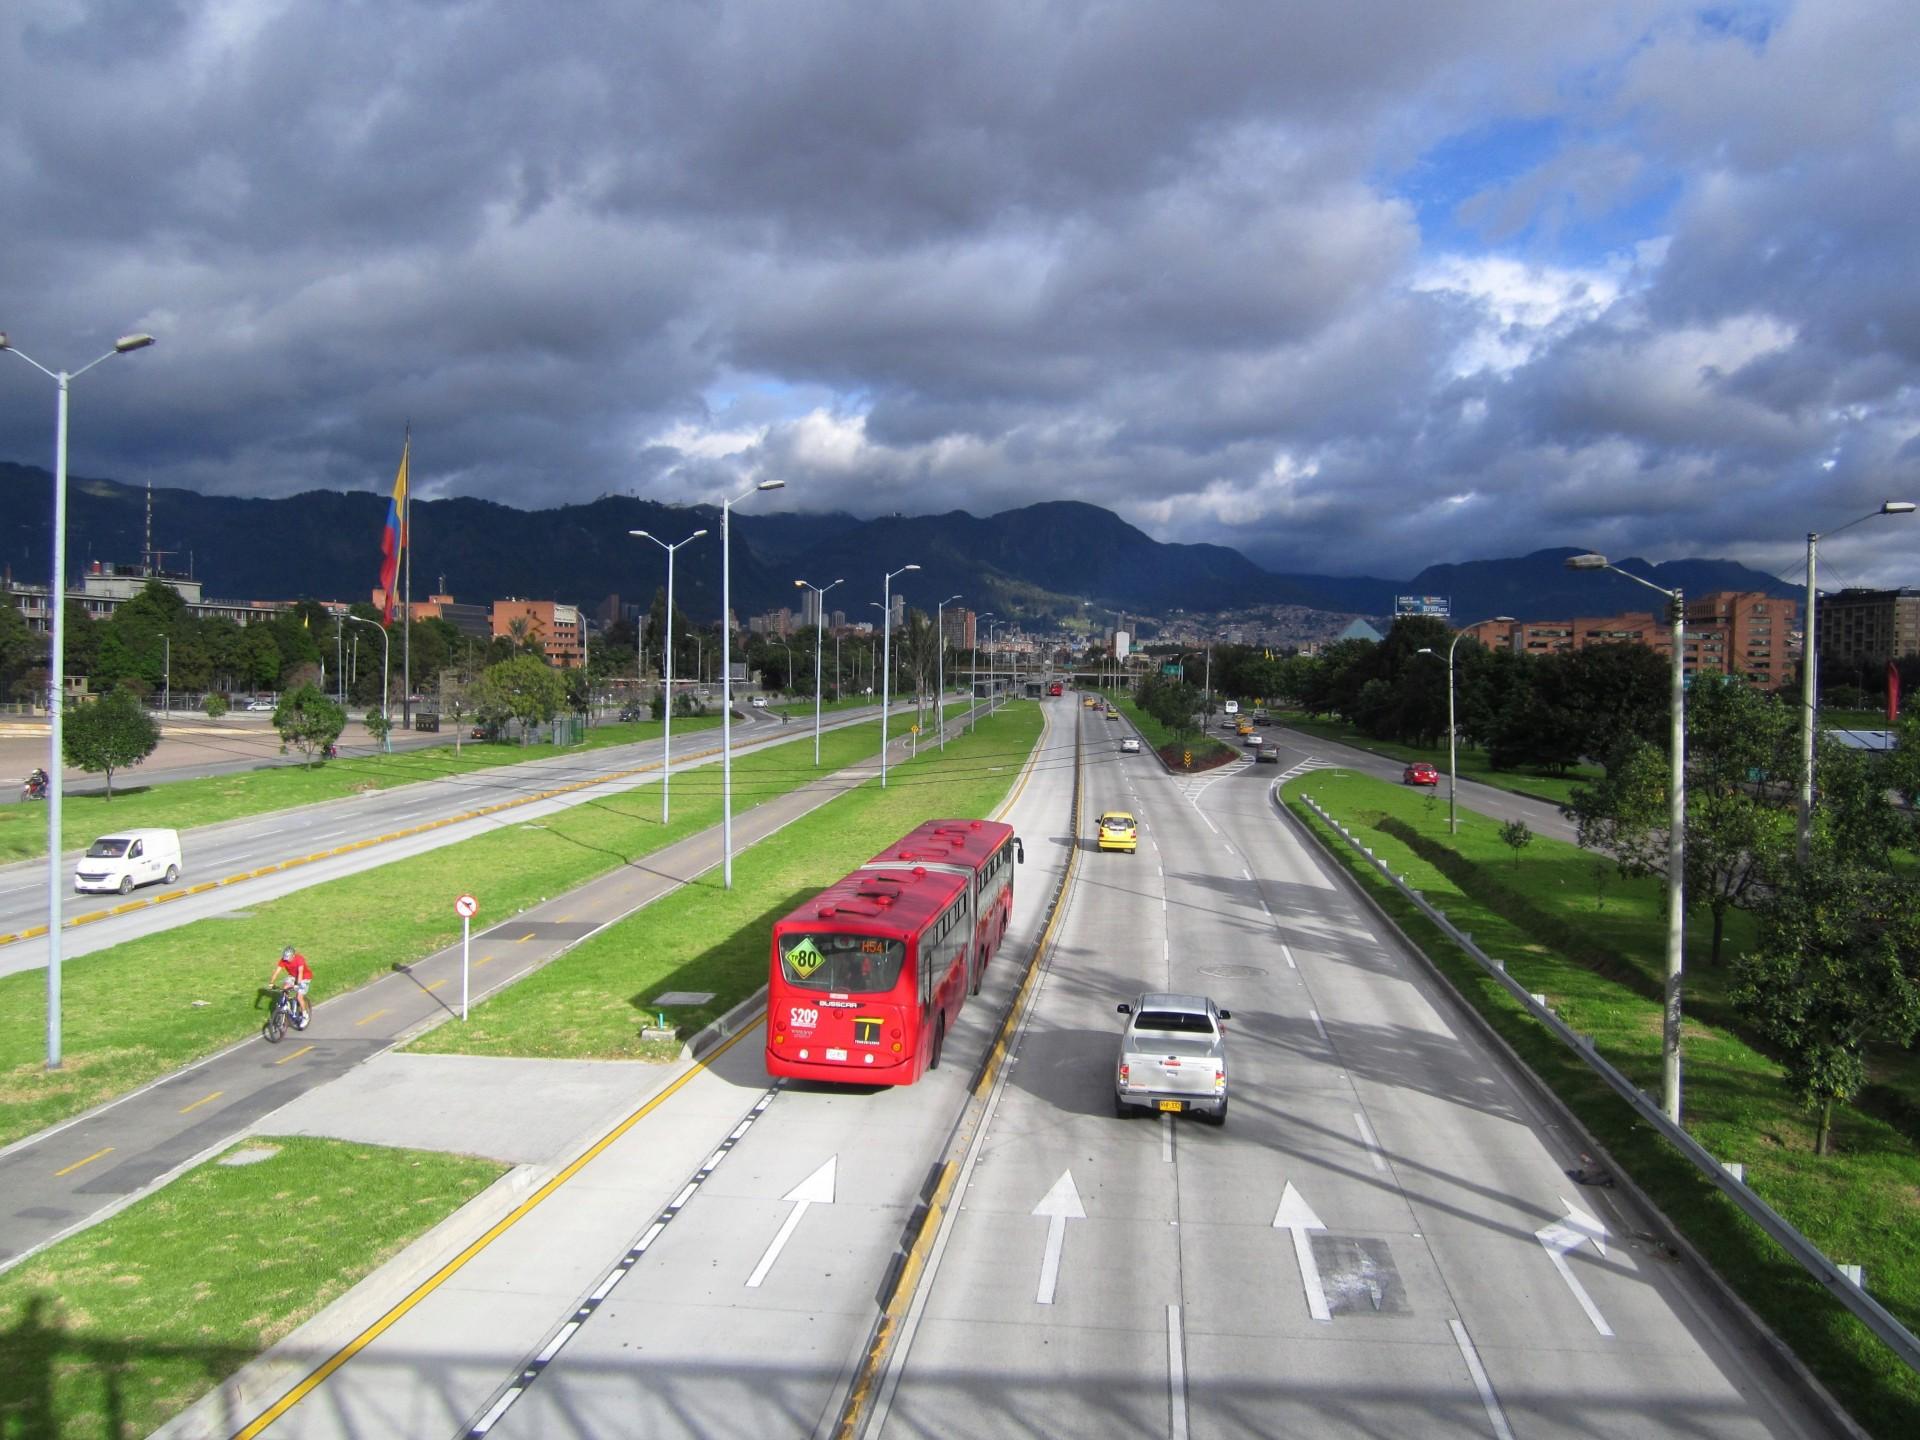 BusTransMilenio Bogotá Colombia